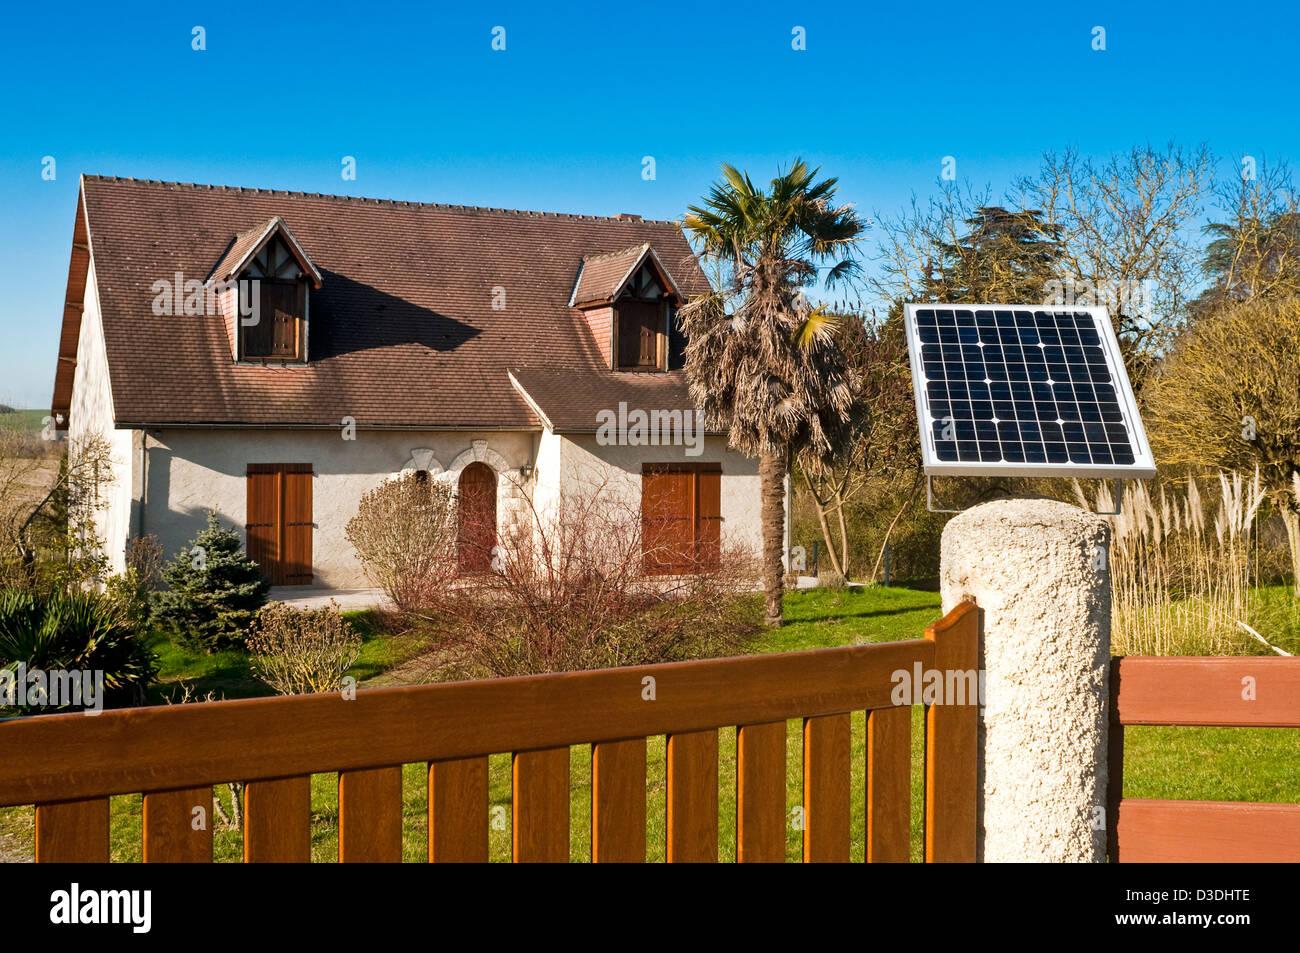 Solar panel on bungalow gatepost - France. - Stock Image